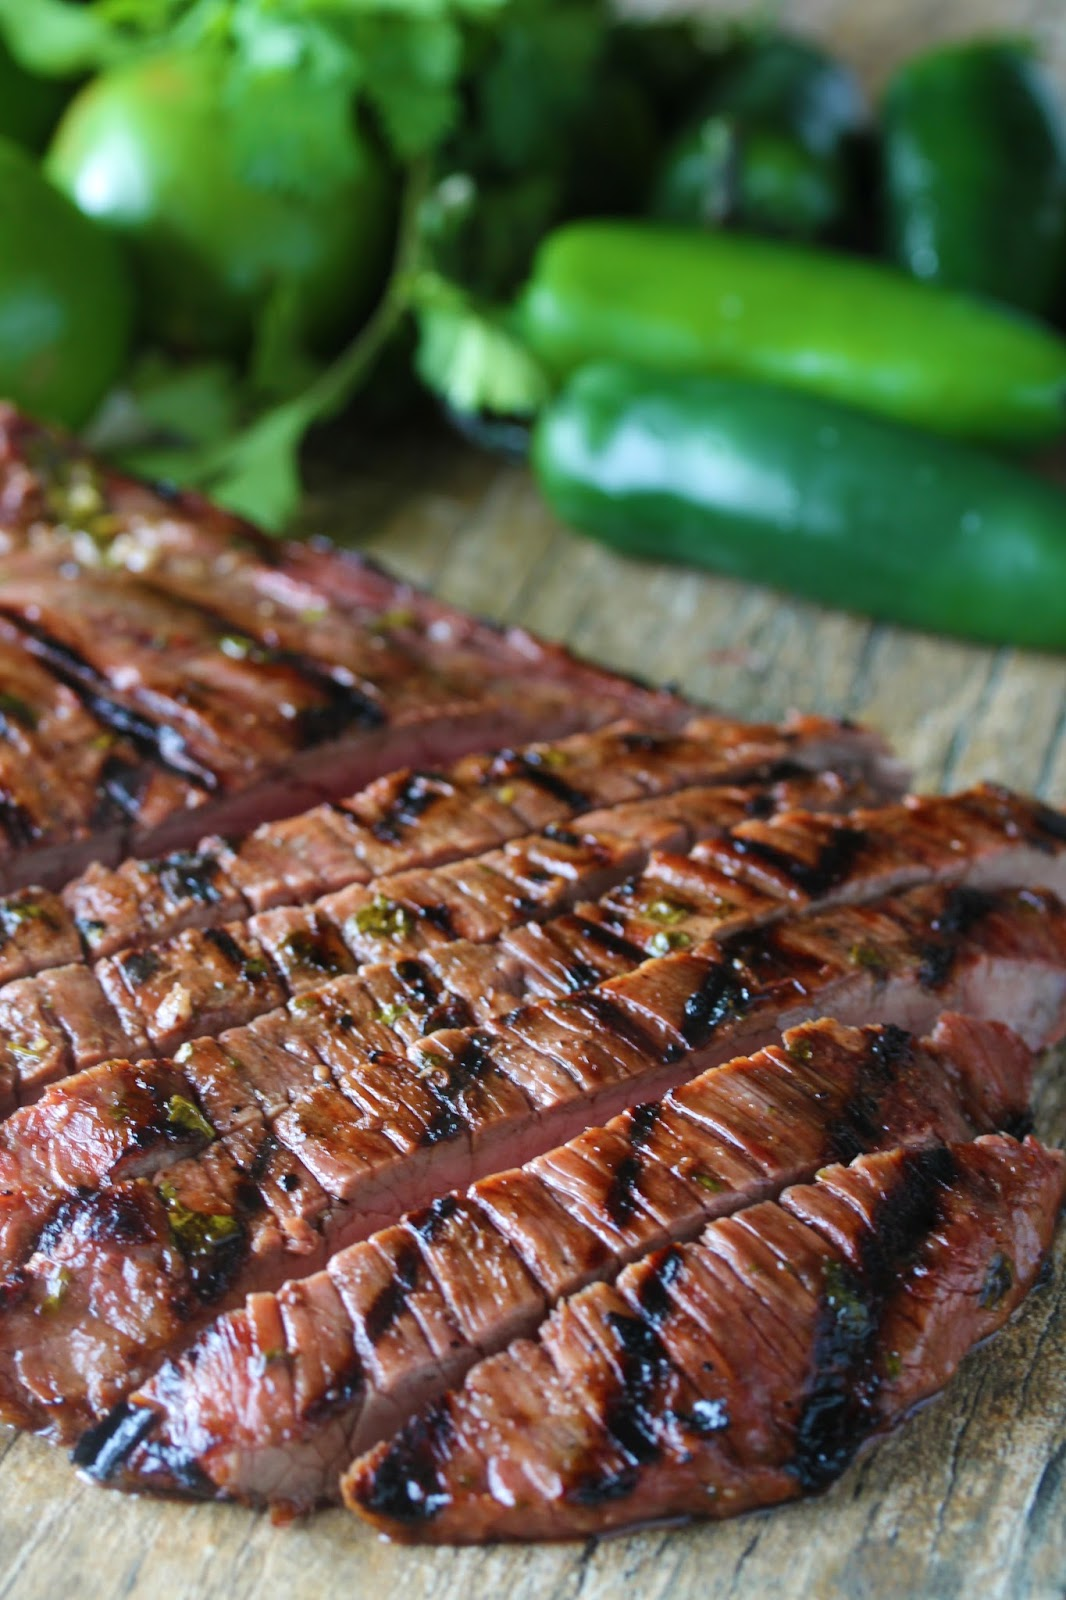 ... carne asada asada carne asada sandwich barbecued meat carne asada